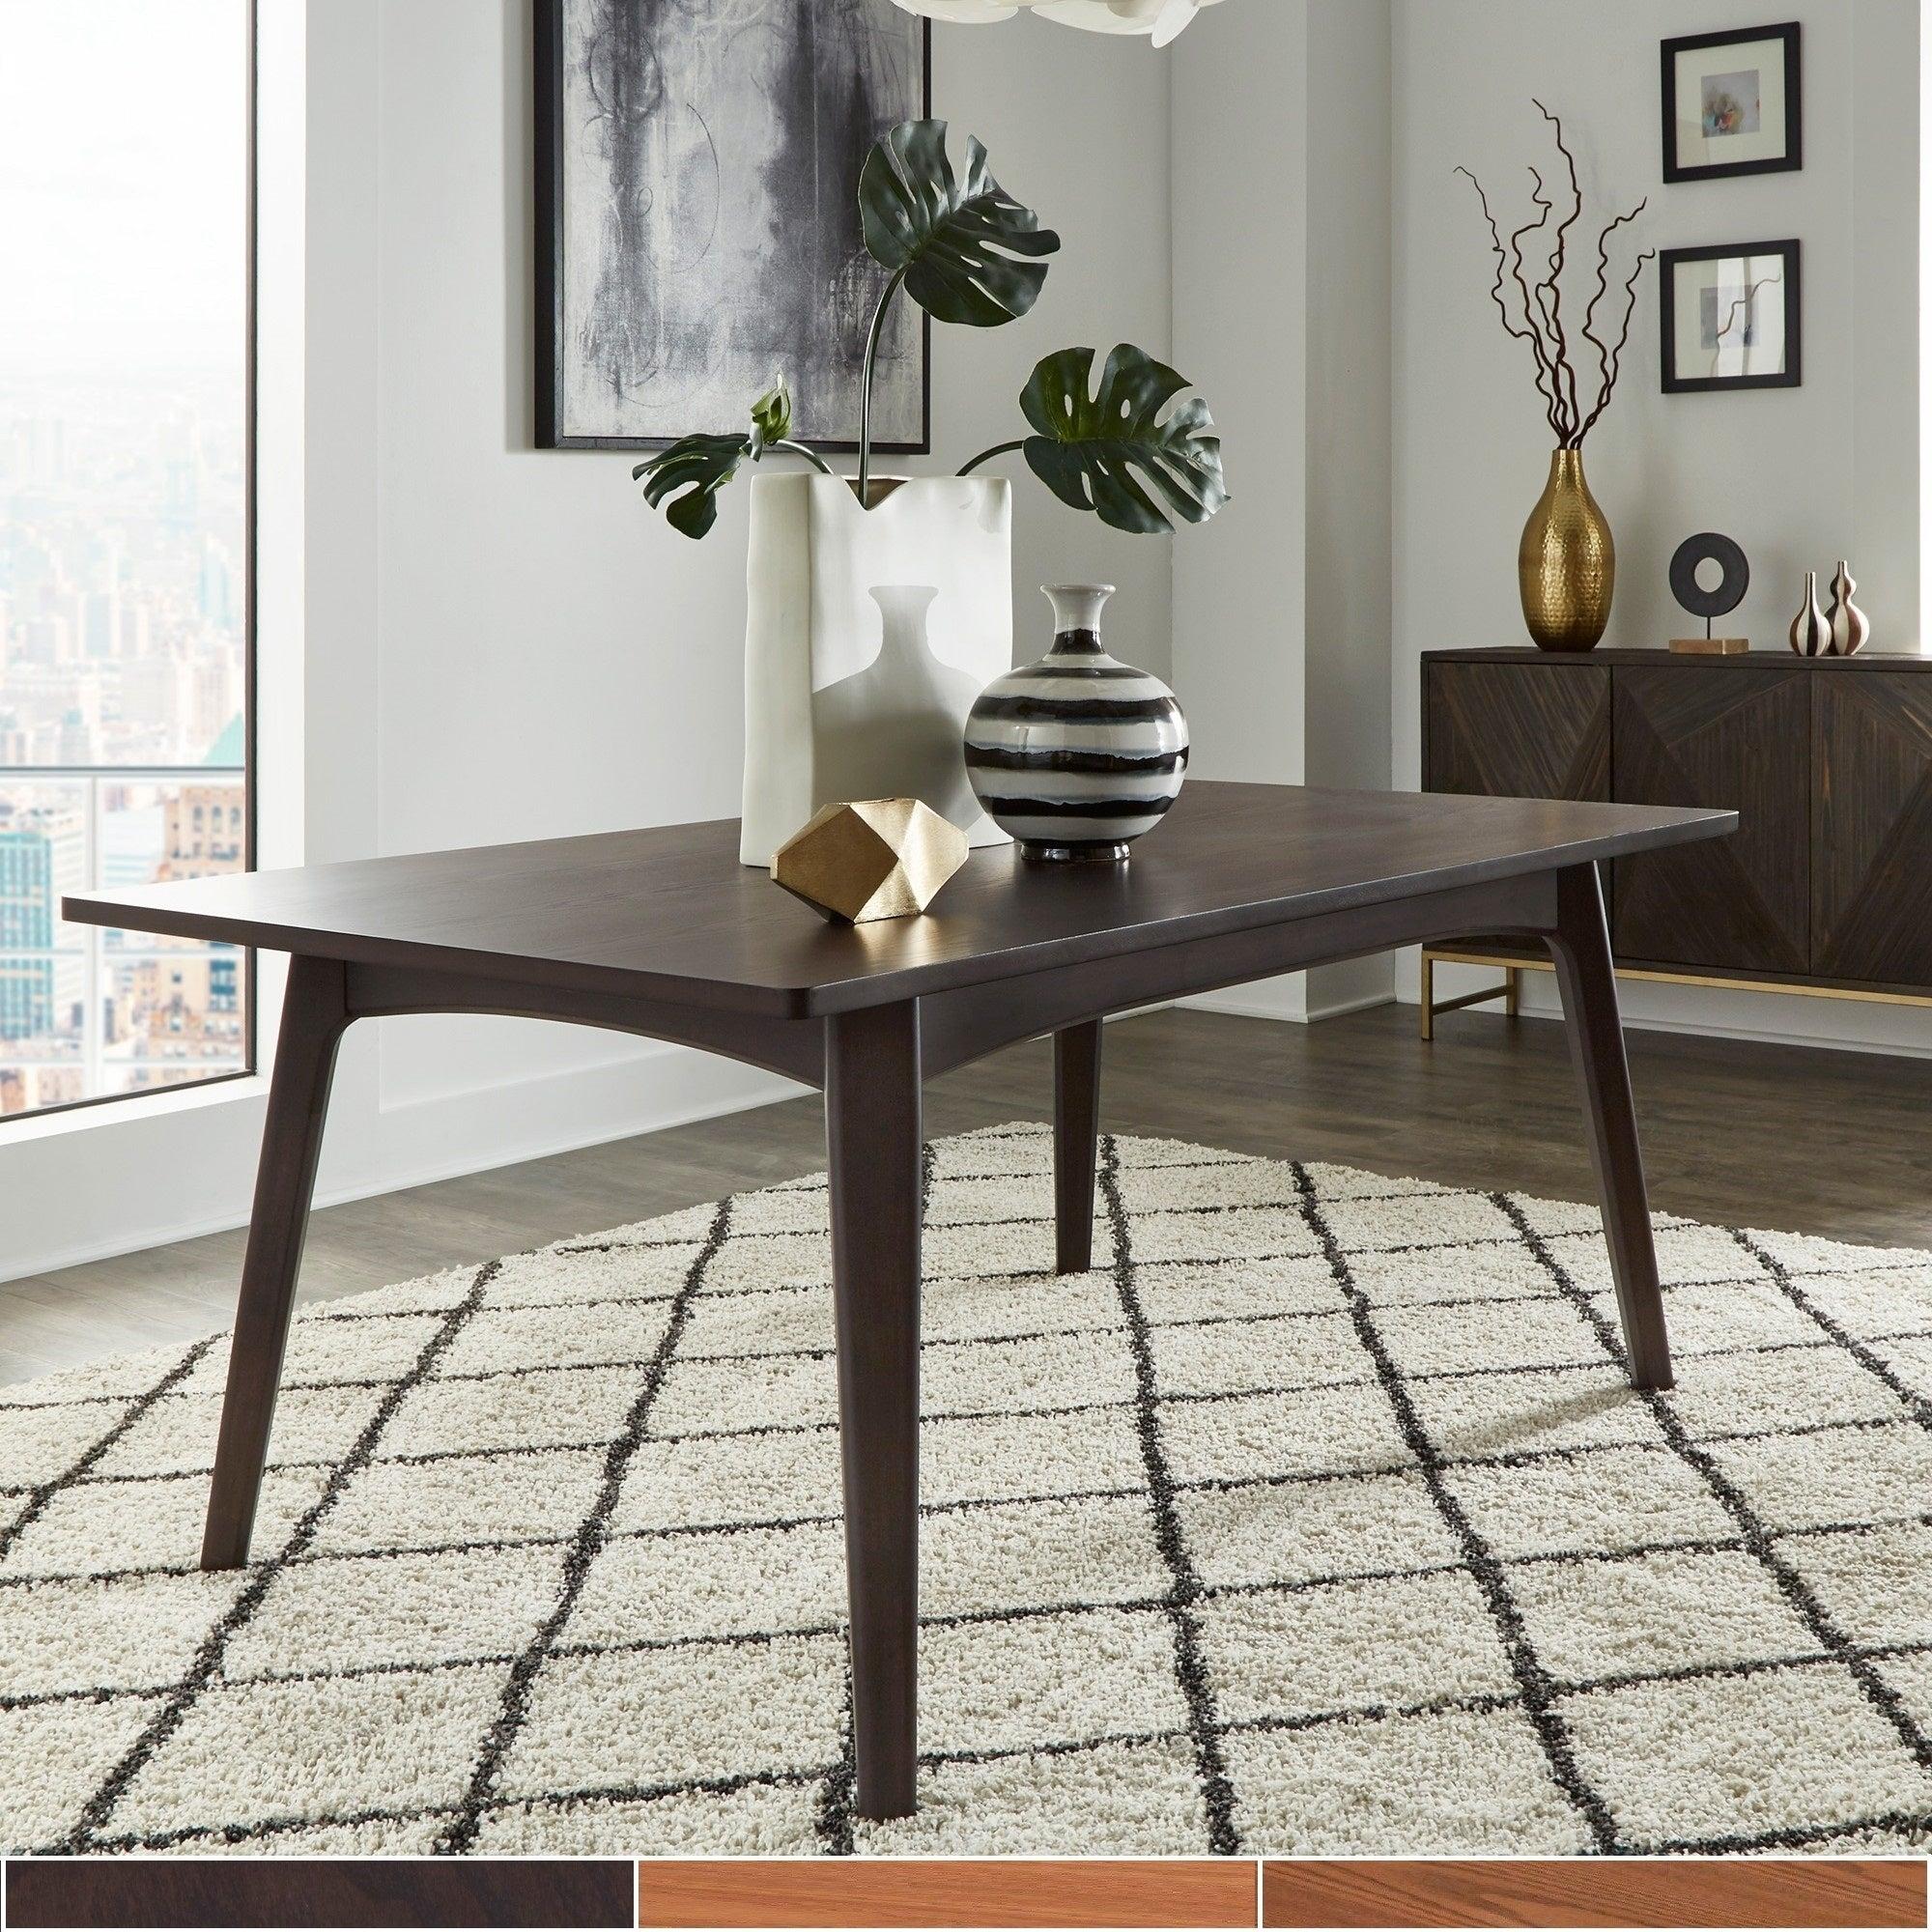 Norwegian Mid Century Danish Modern Tapered Dining Table INSPIRE Q Modern